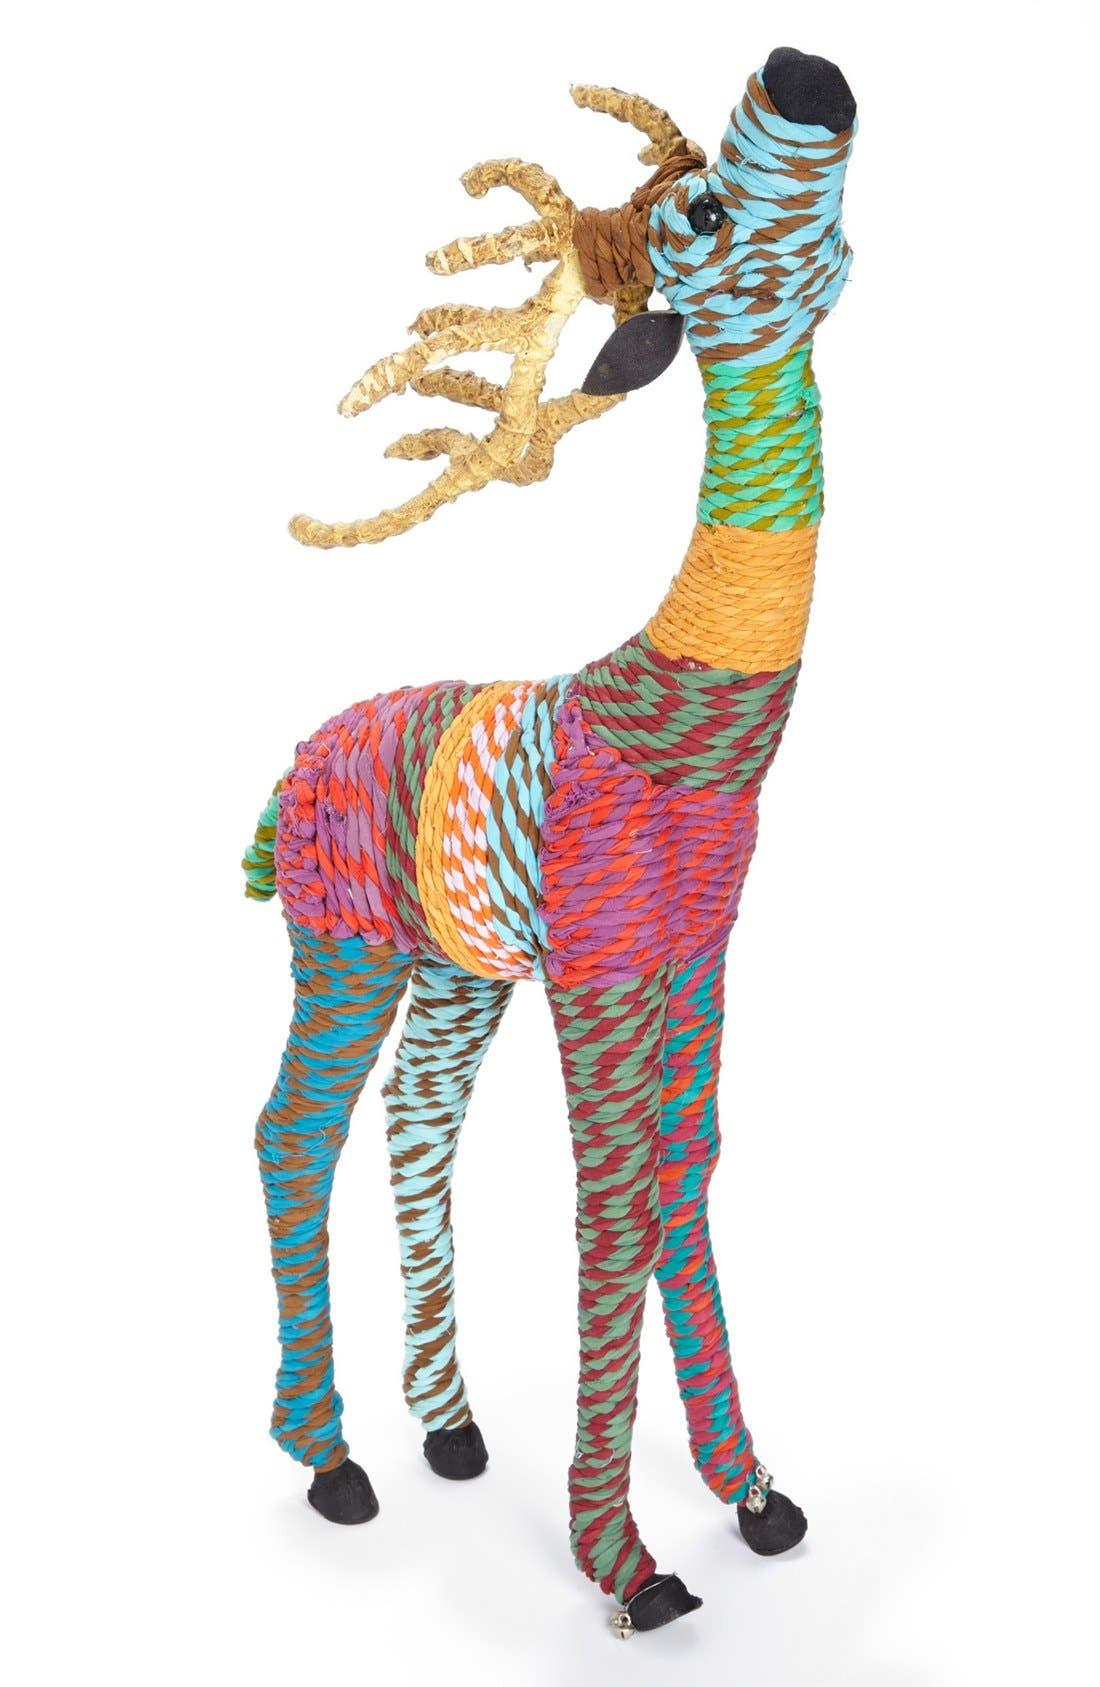 Alternate Image 1 Selected - Shiraleah Chindi Reindeer Decoration, Small